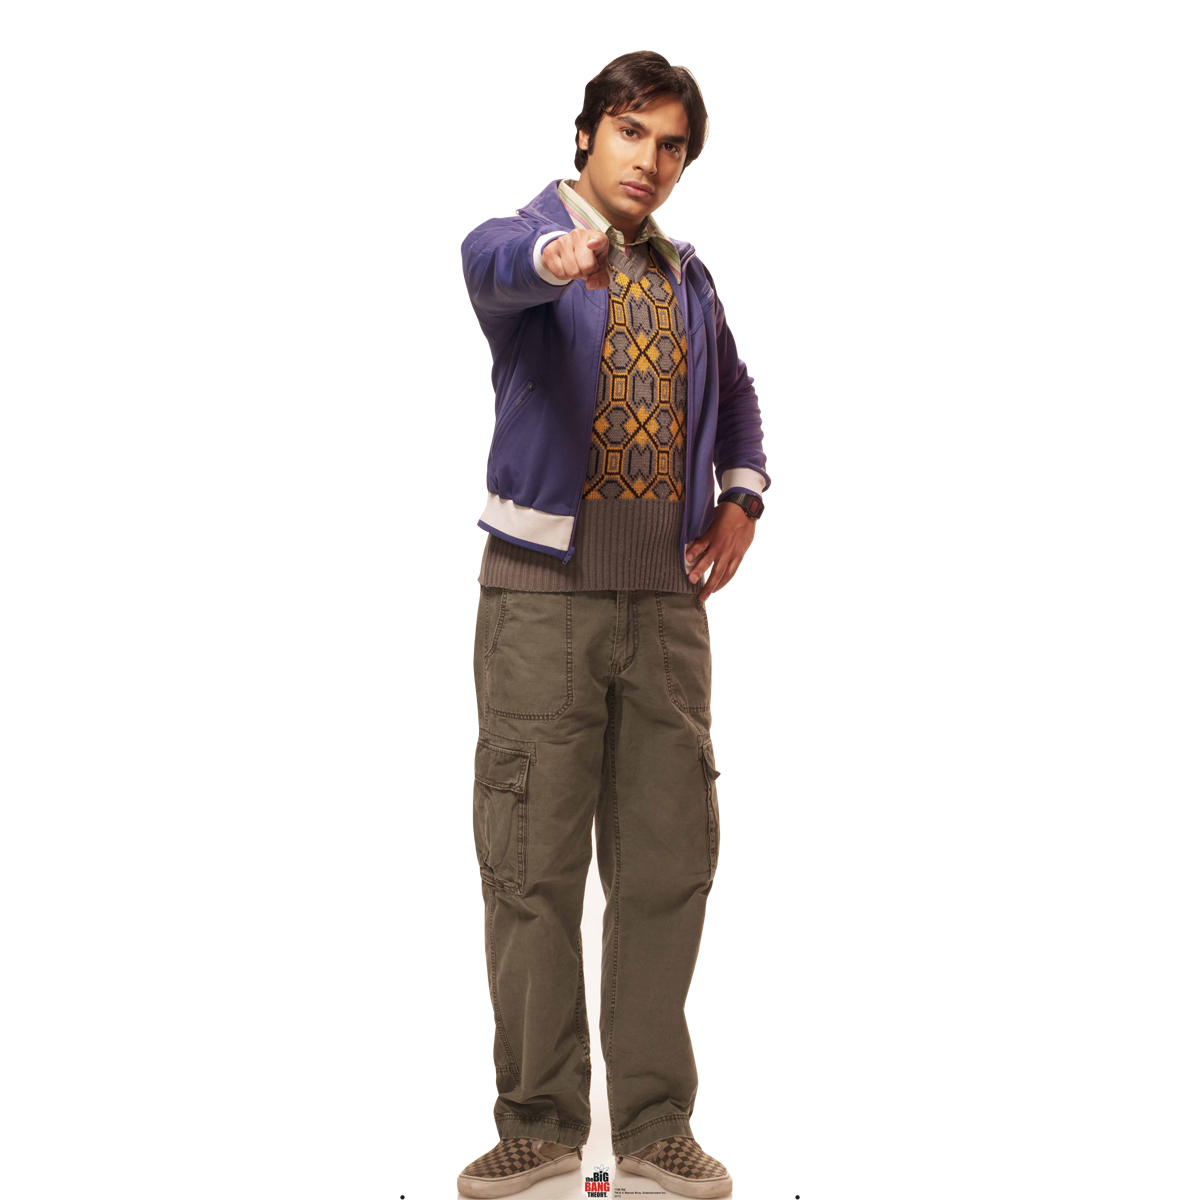 The Big Bang Theory Raj Standee - Toys & Games 2870-360513